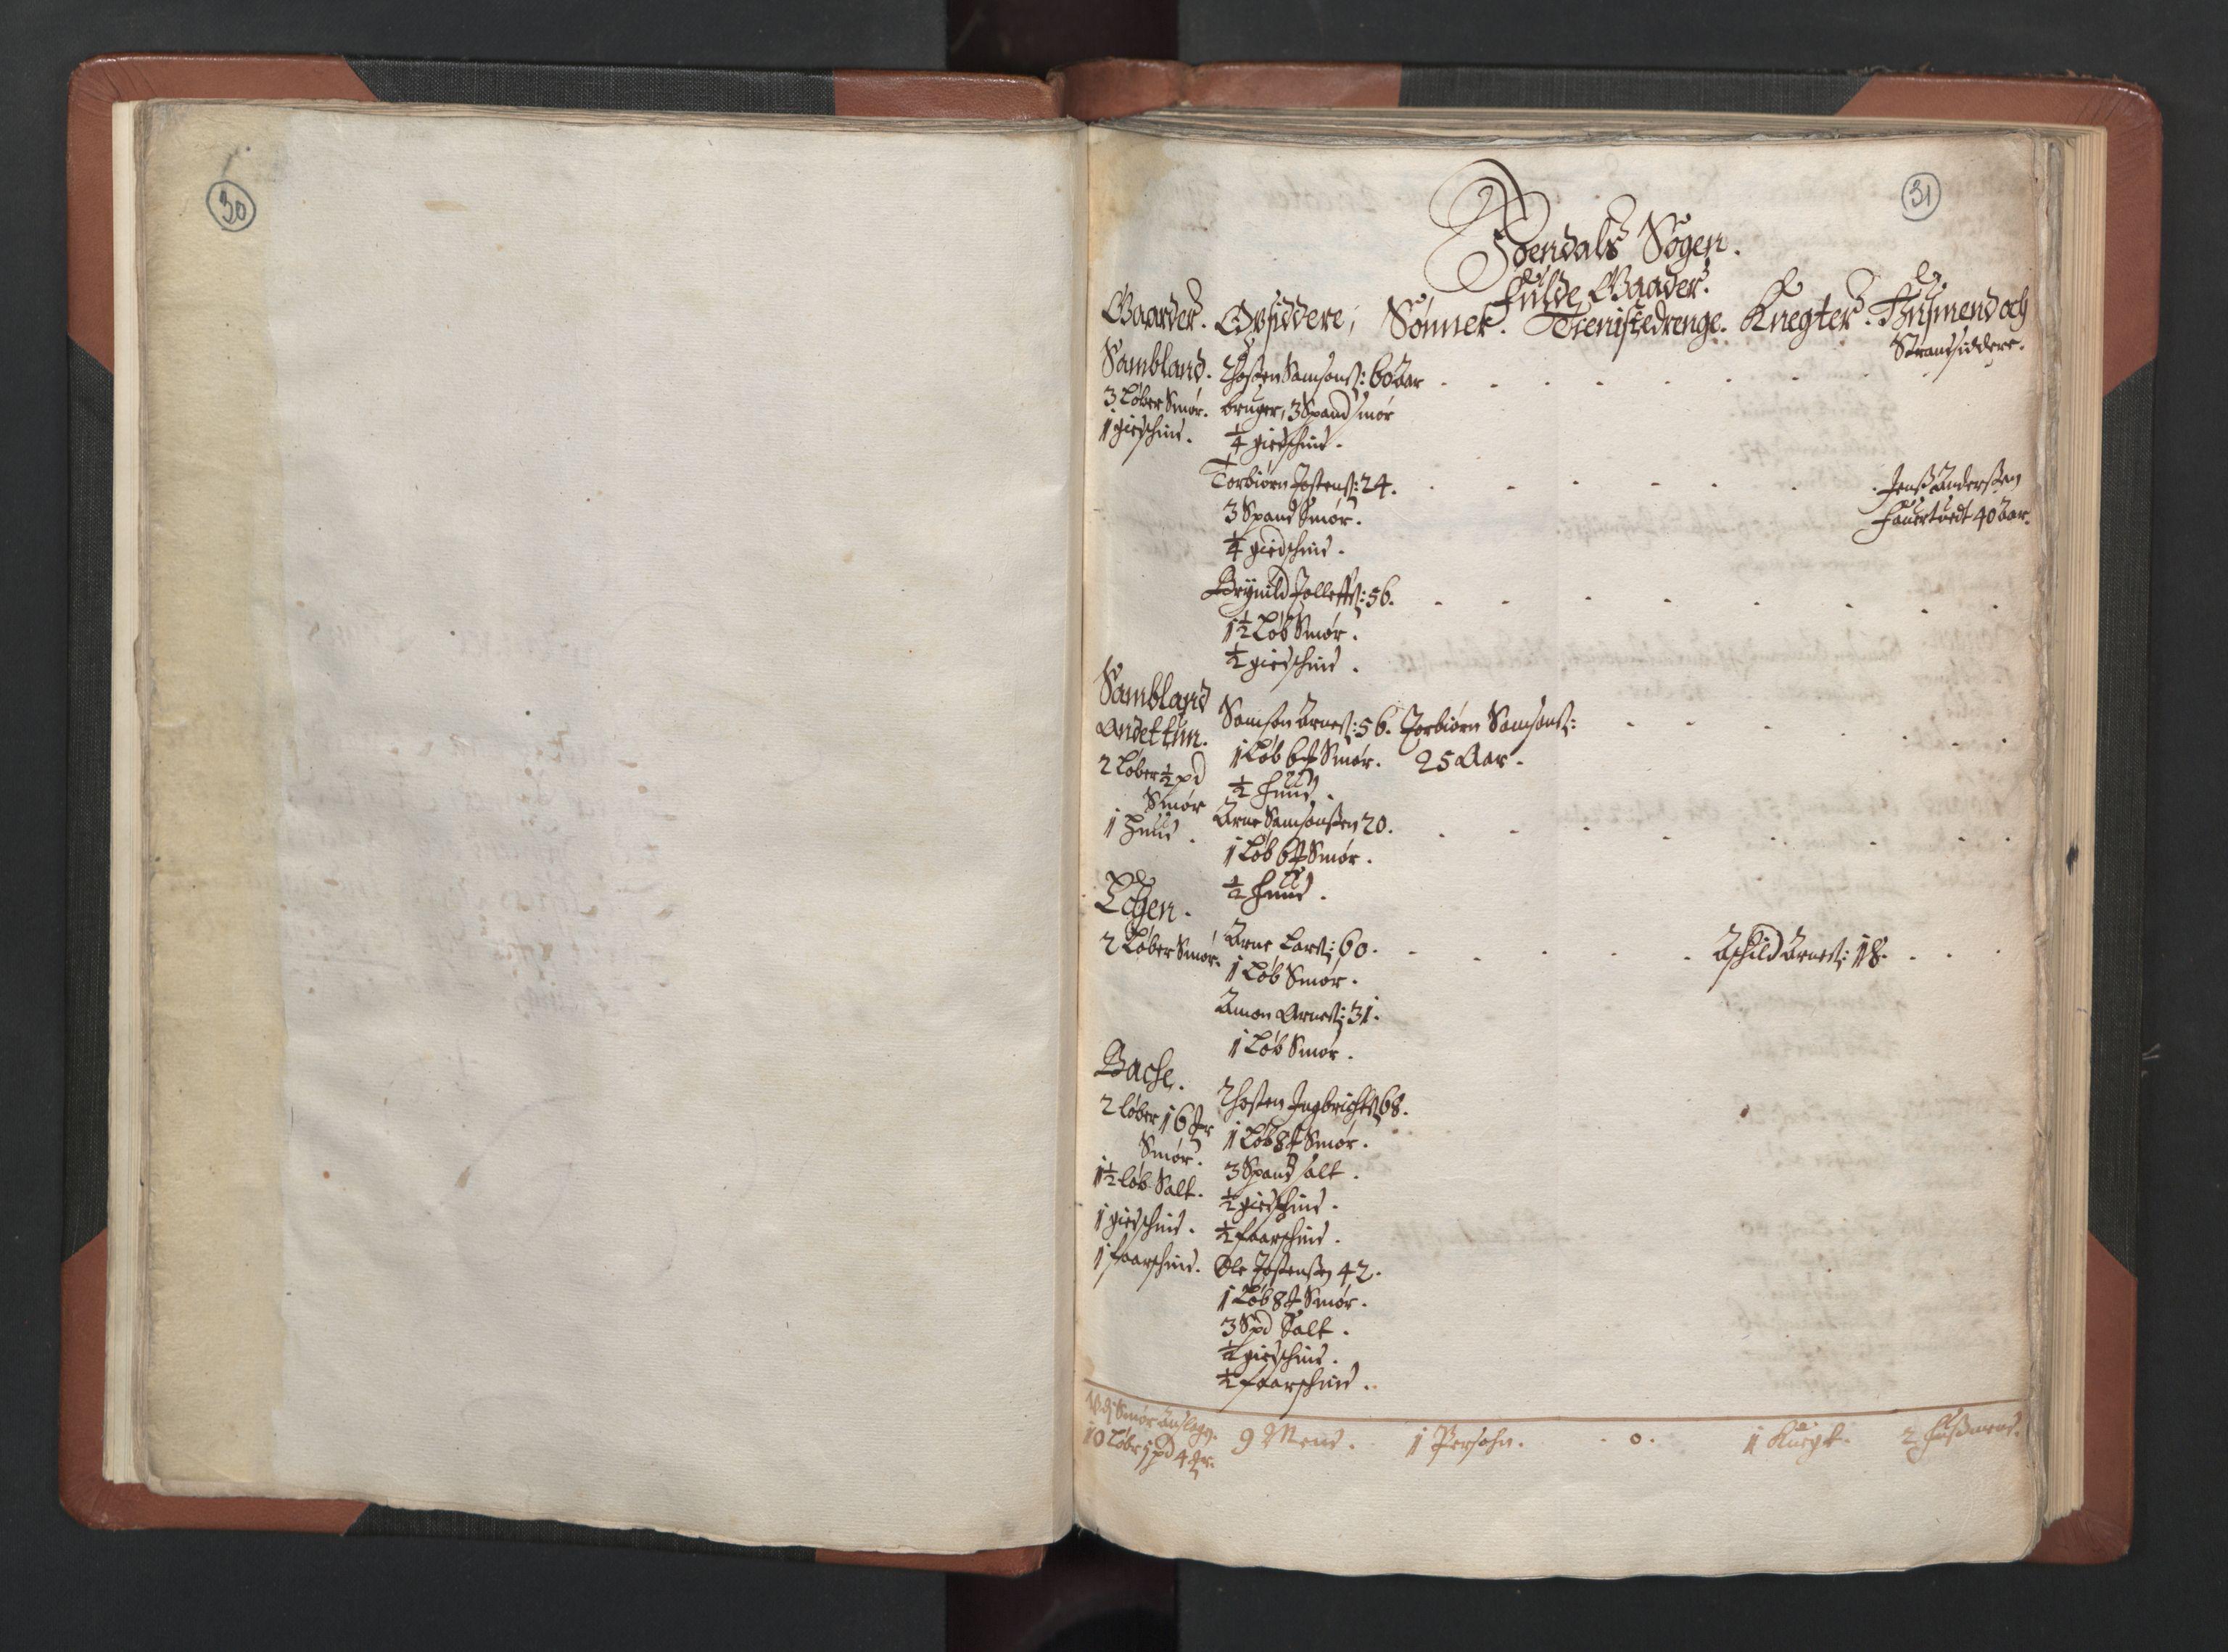 RA, Fogdenes og sorenskrivernes manntall 1664-1666, nr. 14: Hardanger len, Ytre Sogn fogderi og Indre Sogn fogderi, 1664-1665, s. 30-31